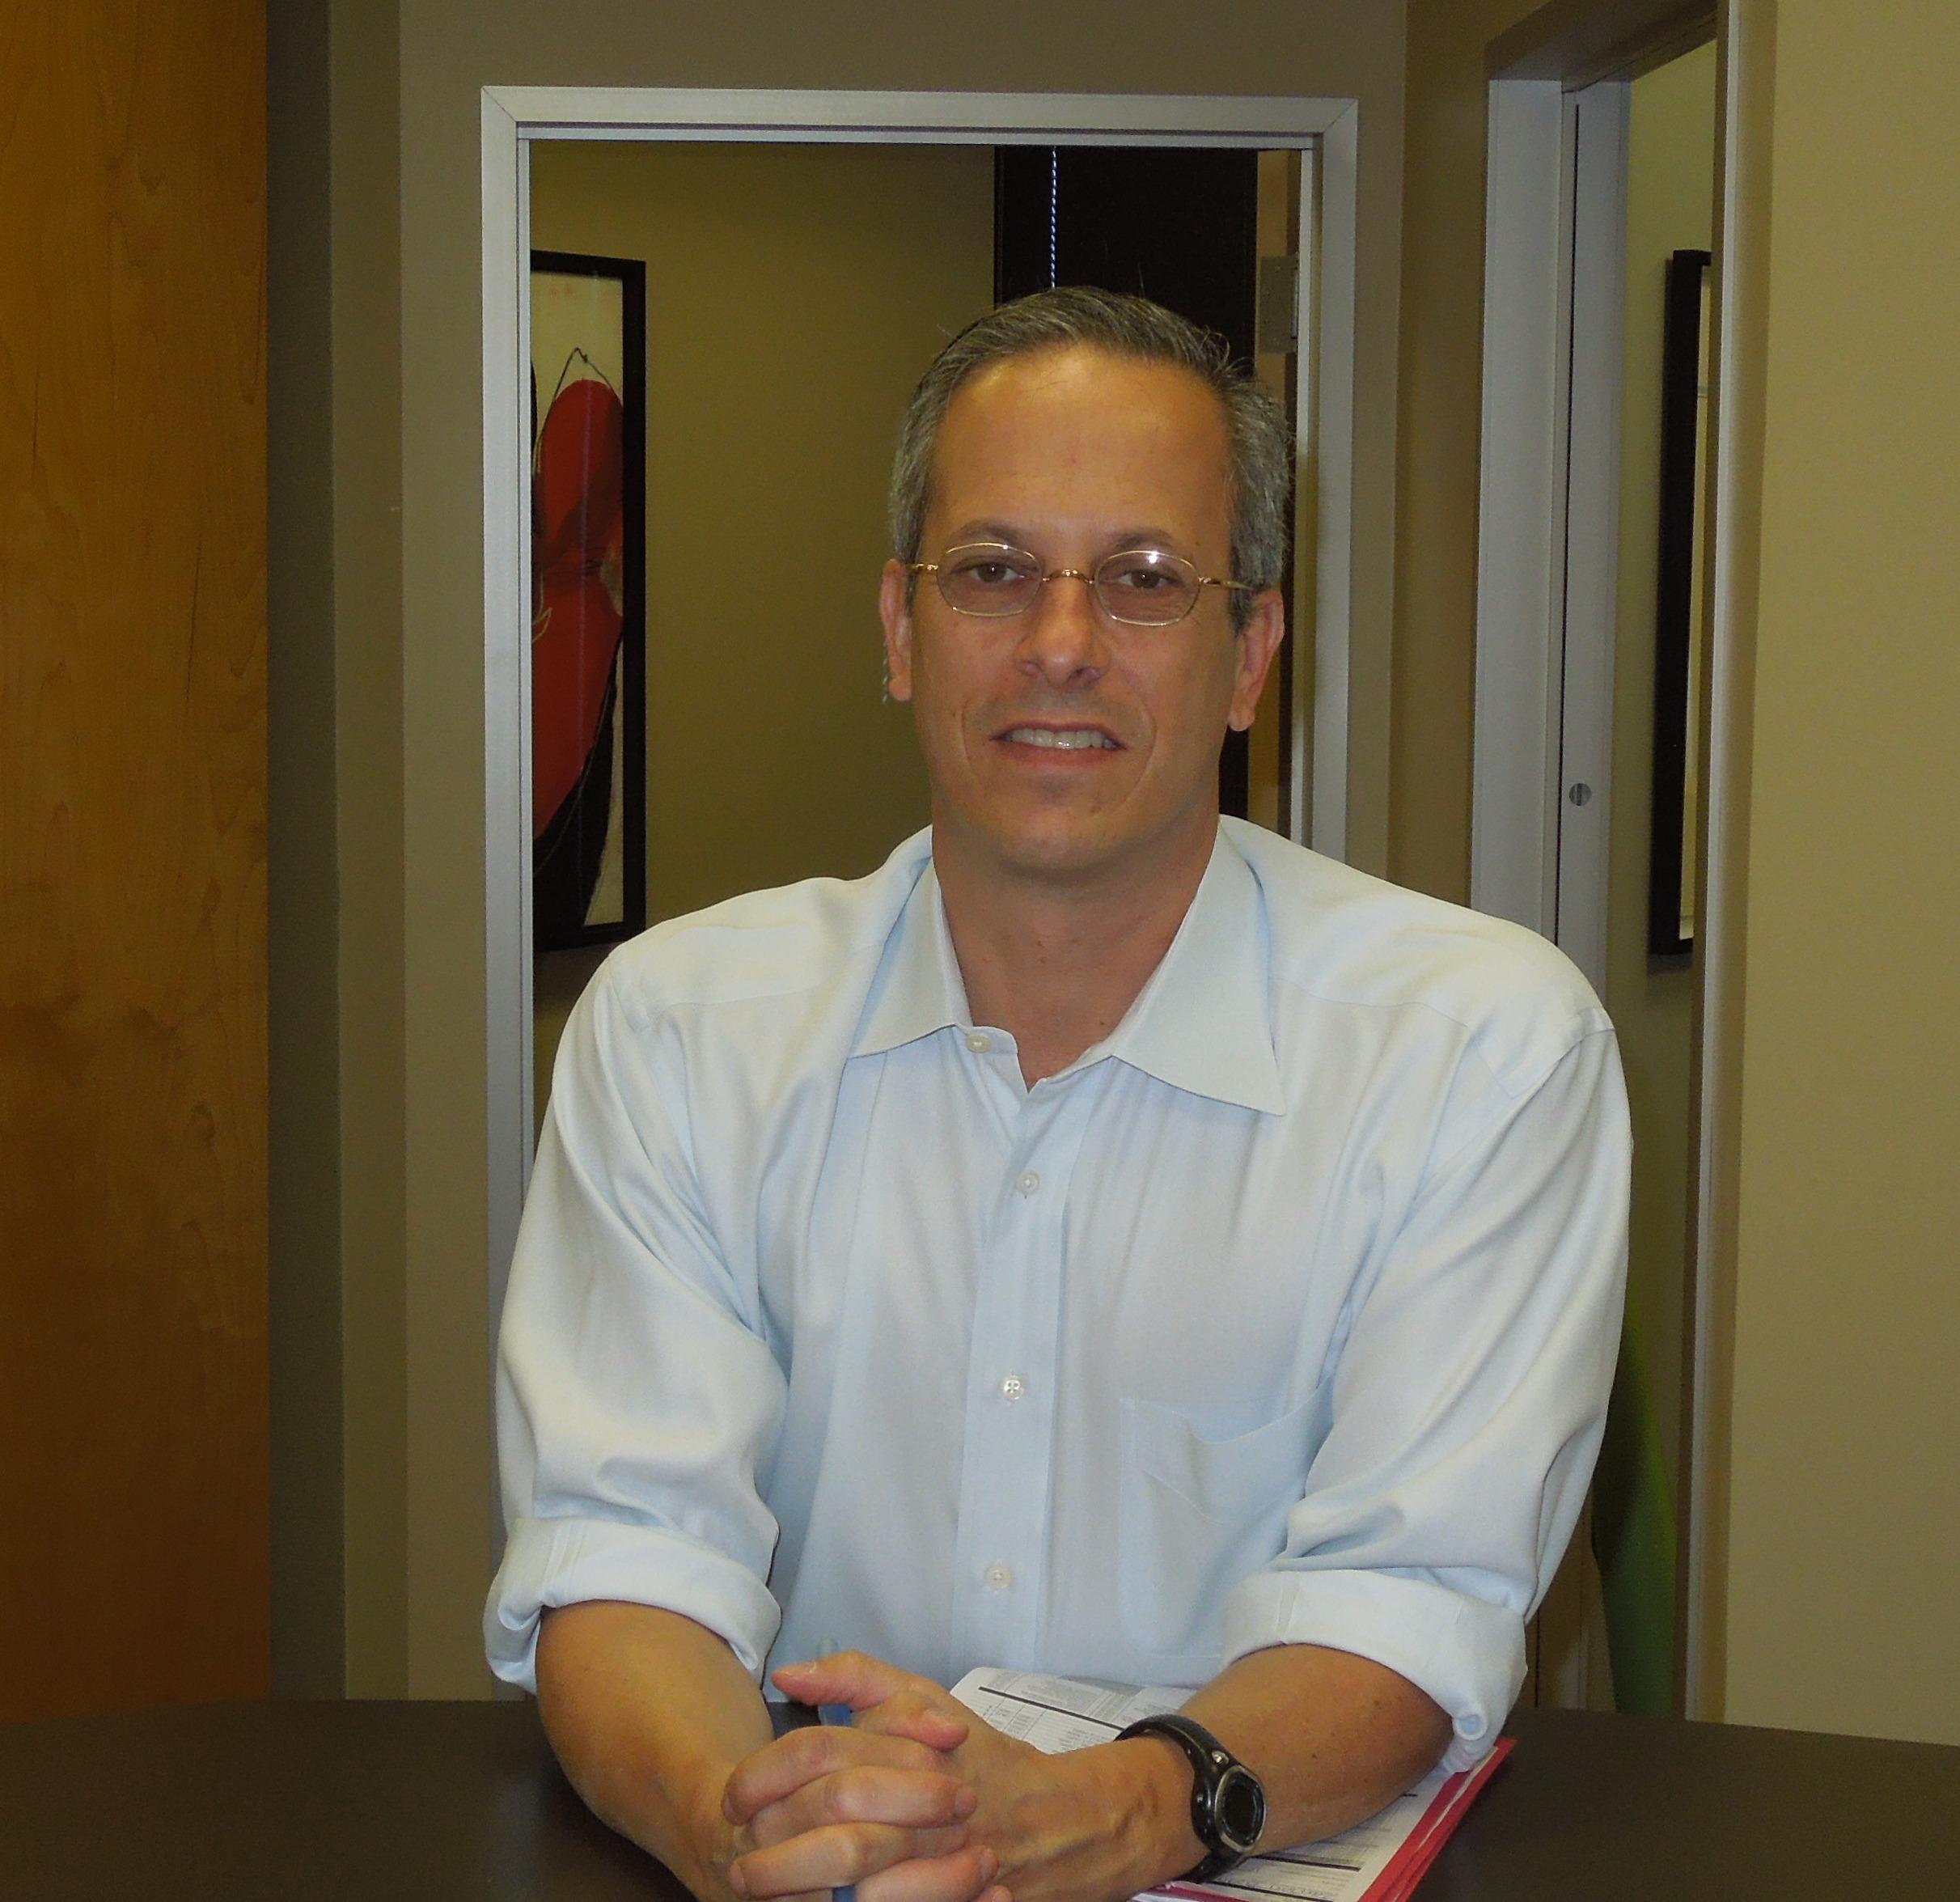 Dr. Steven Becker - Los Angeles Chiropractor